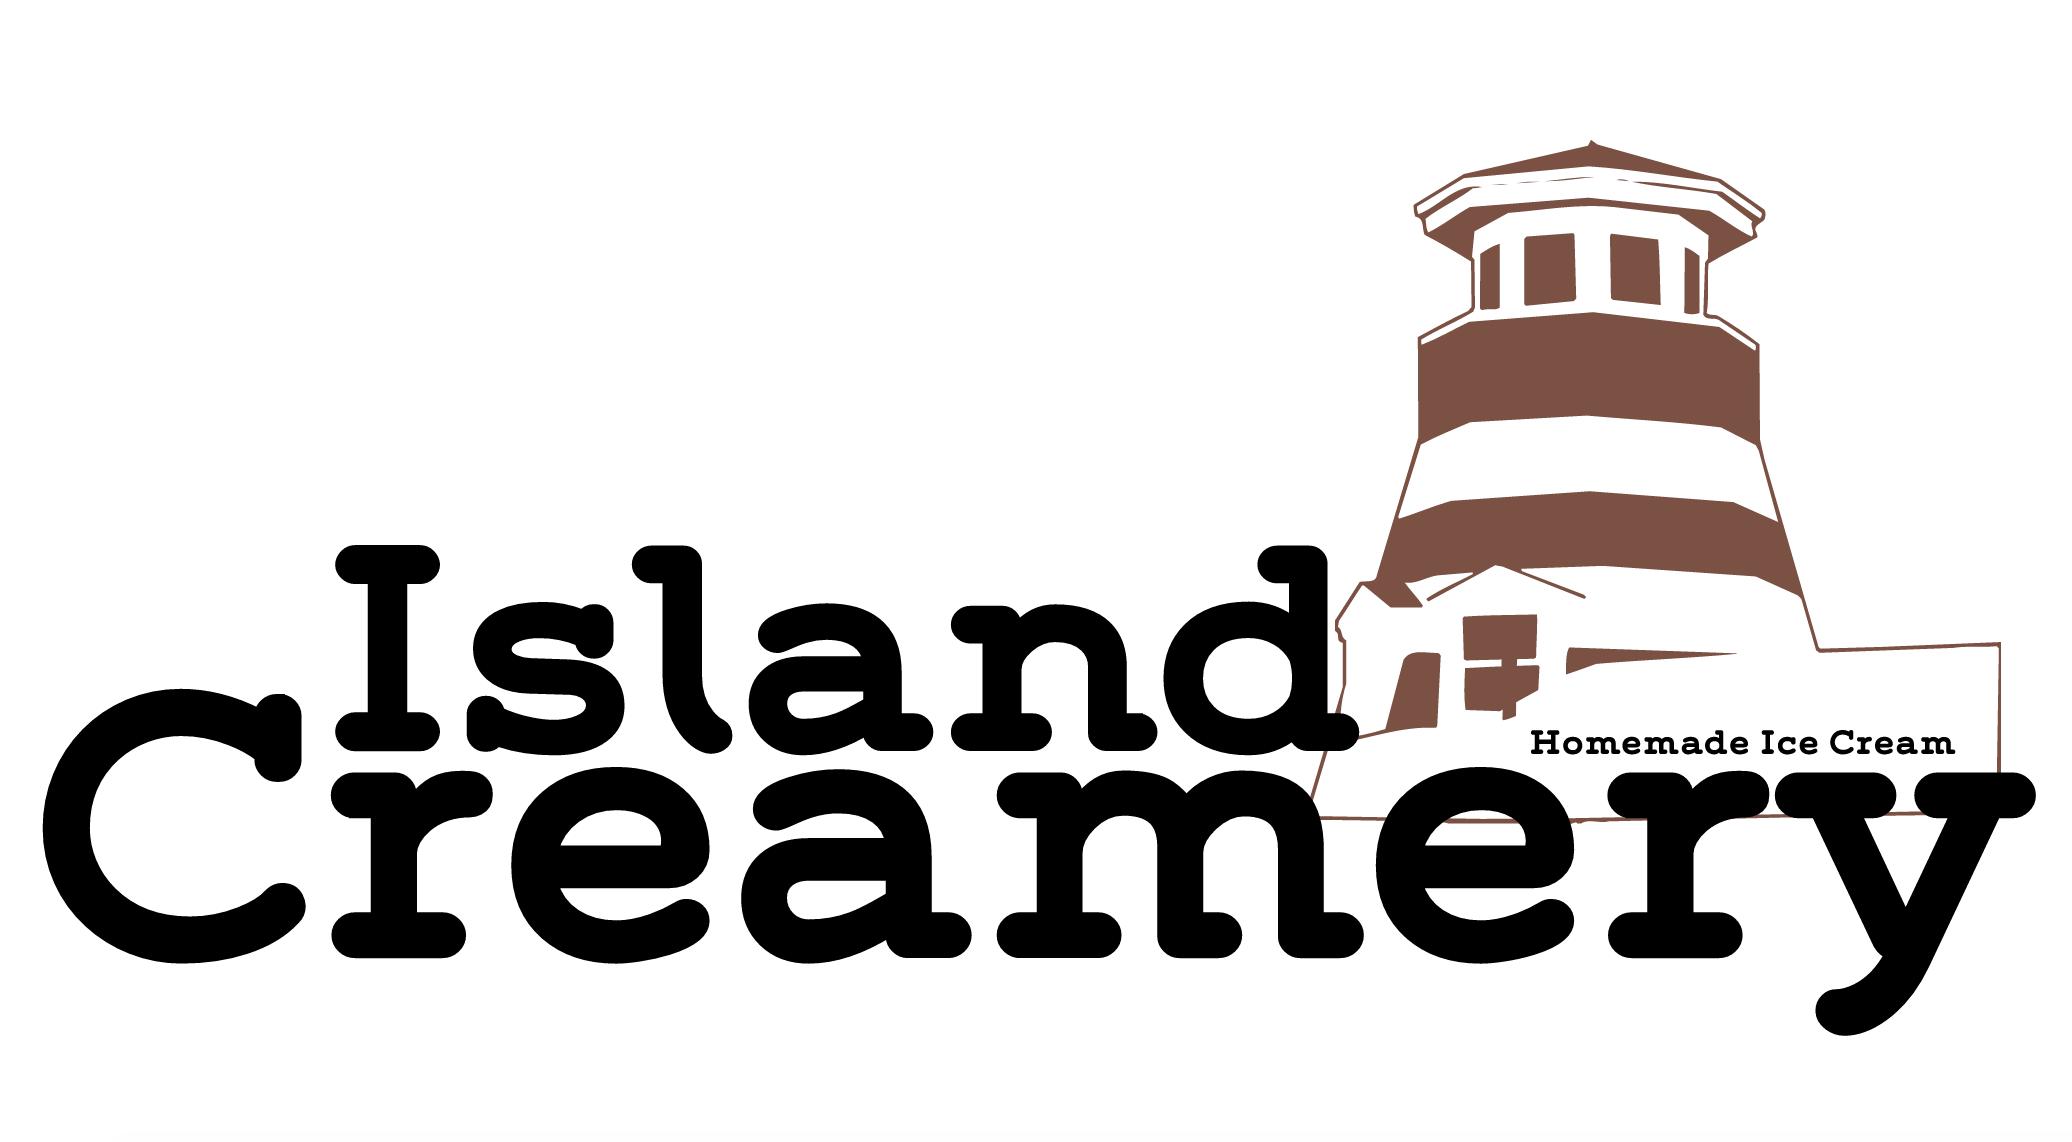 Island Creamery  120 N S Main St,  Berlin, MD 21811